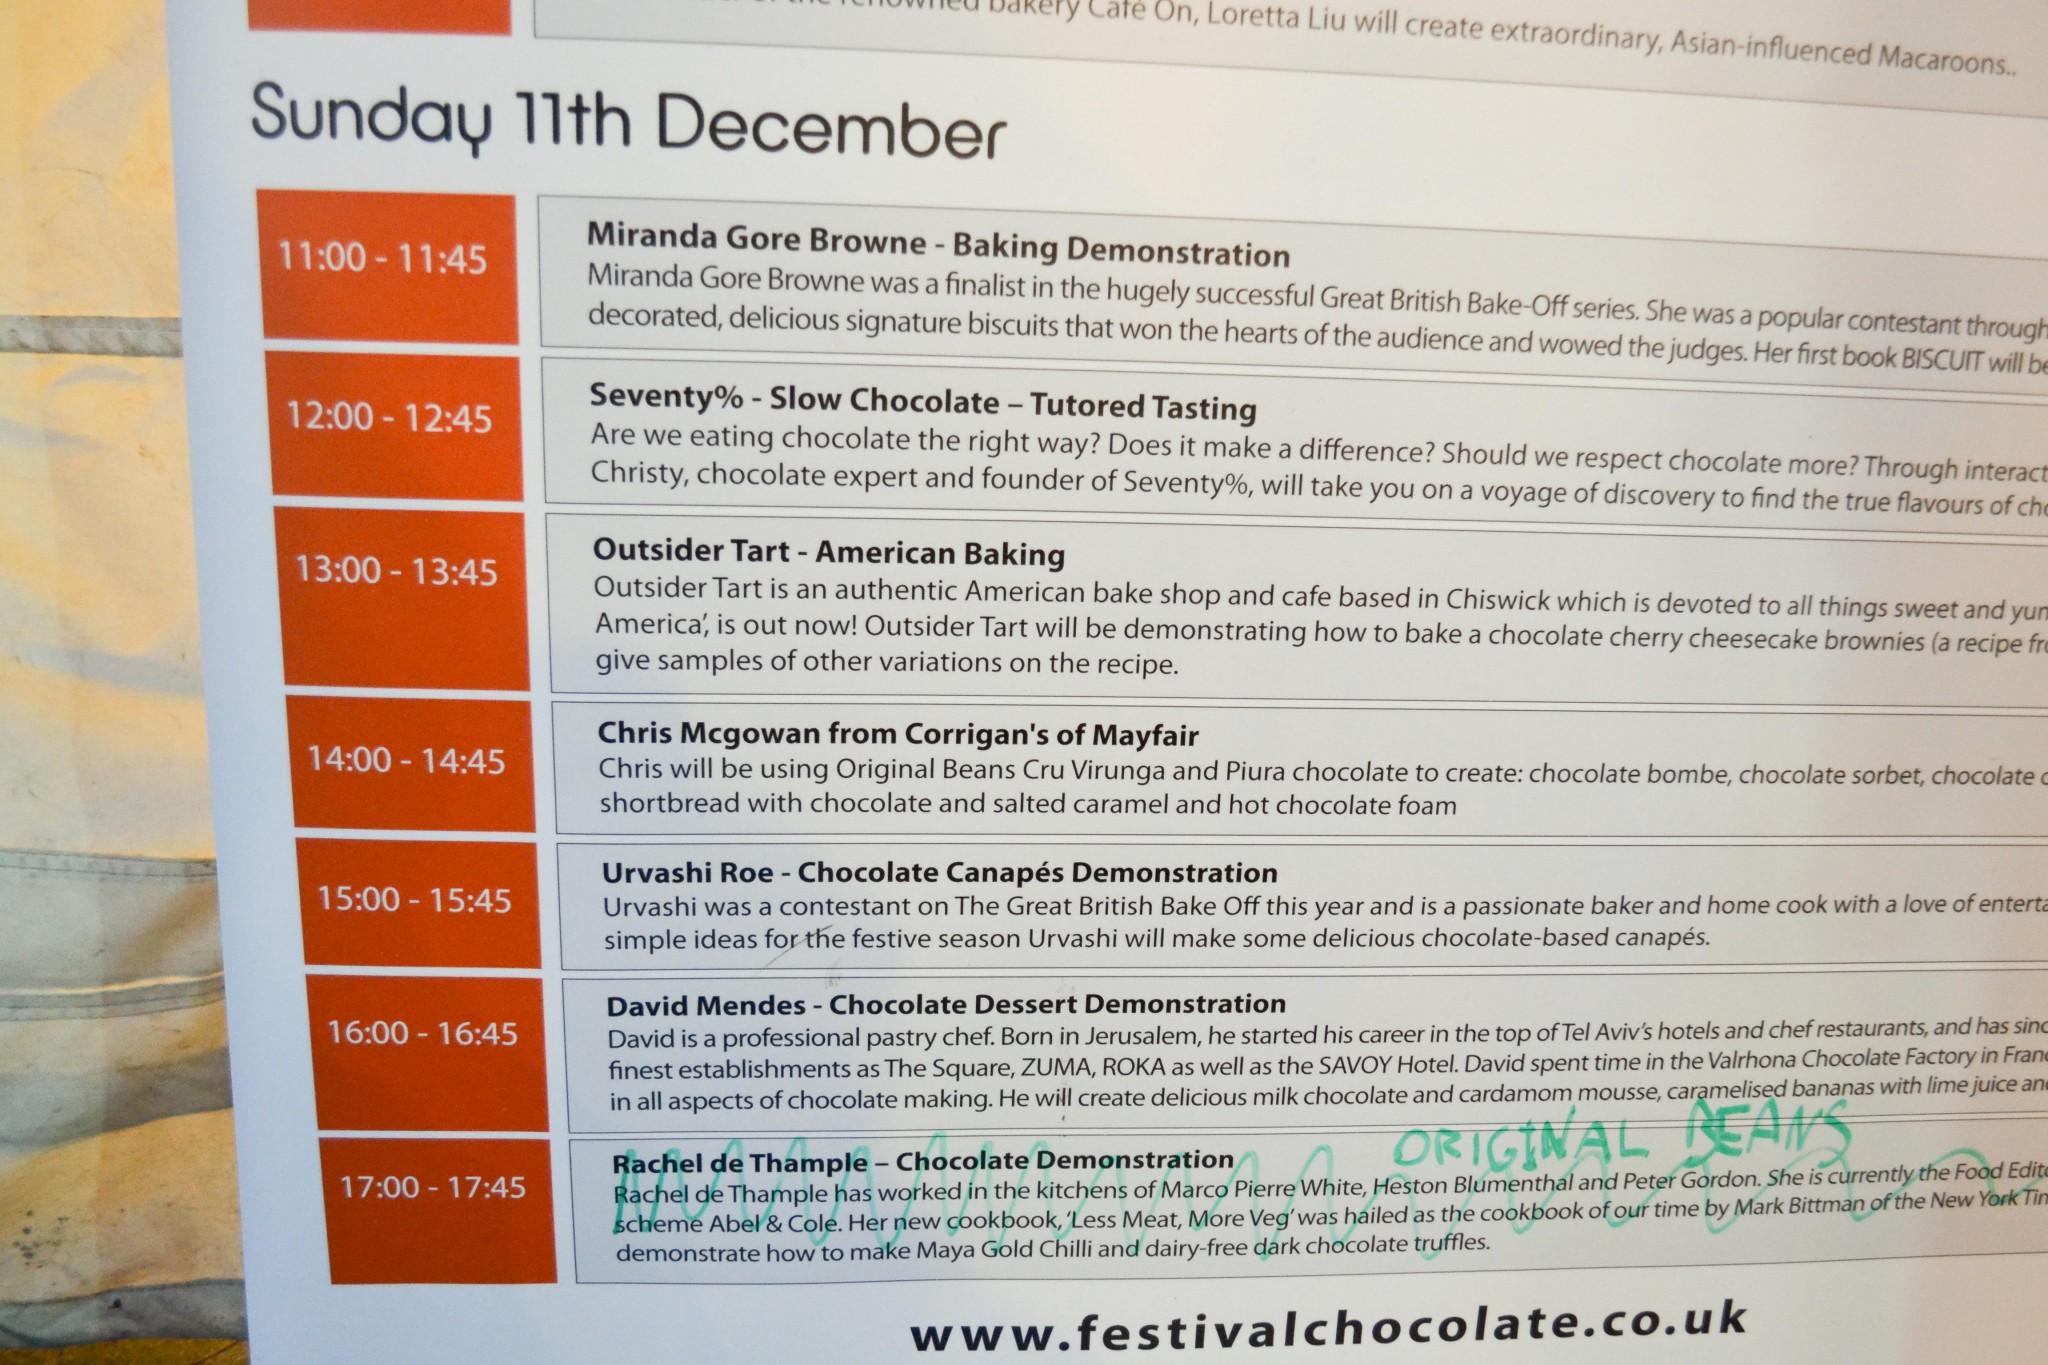 Chocolate Festival London Southbank Dec 11 2011